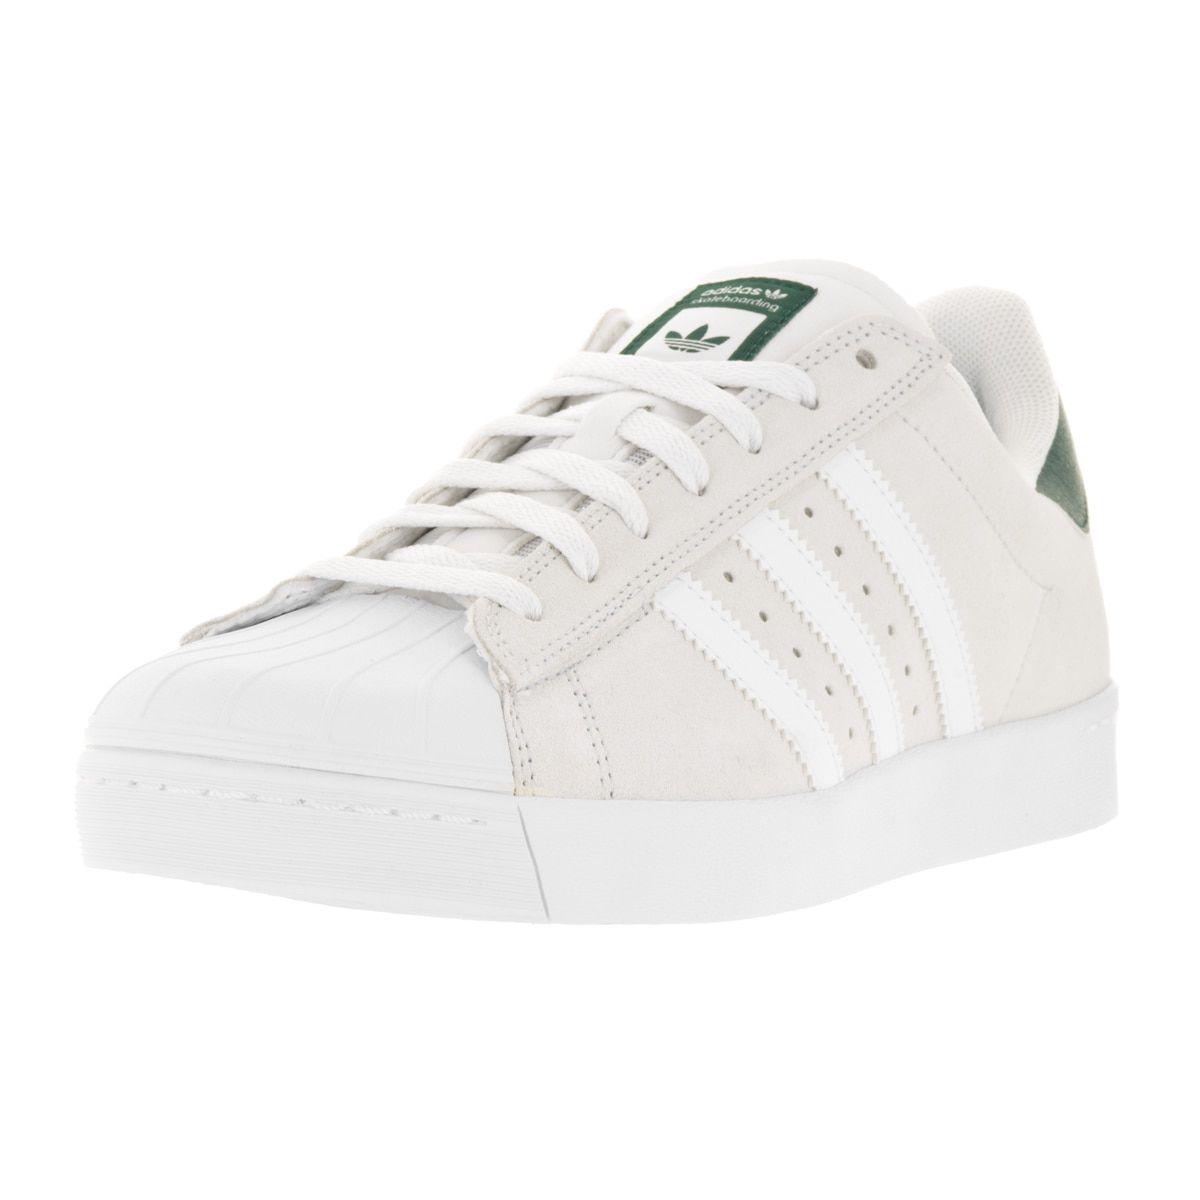 Adidas Men's Superstar Vulc Adv Casual Shoe | Adidas Shoes